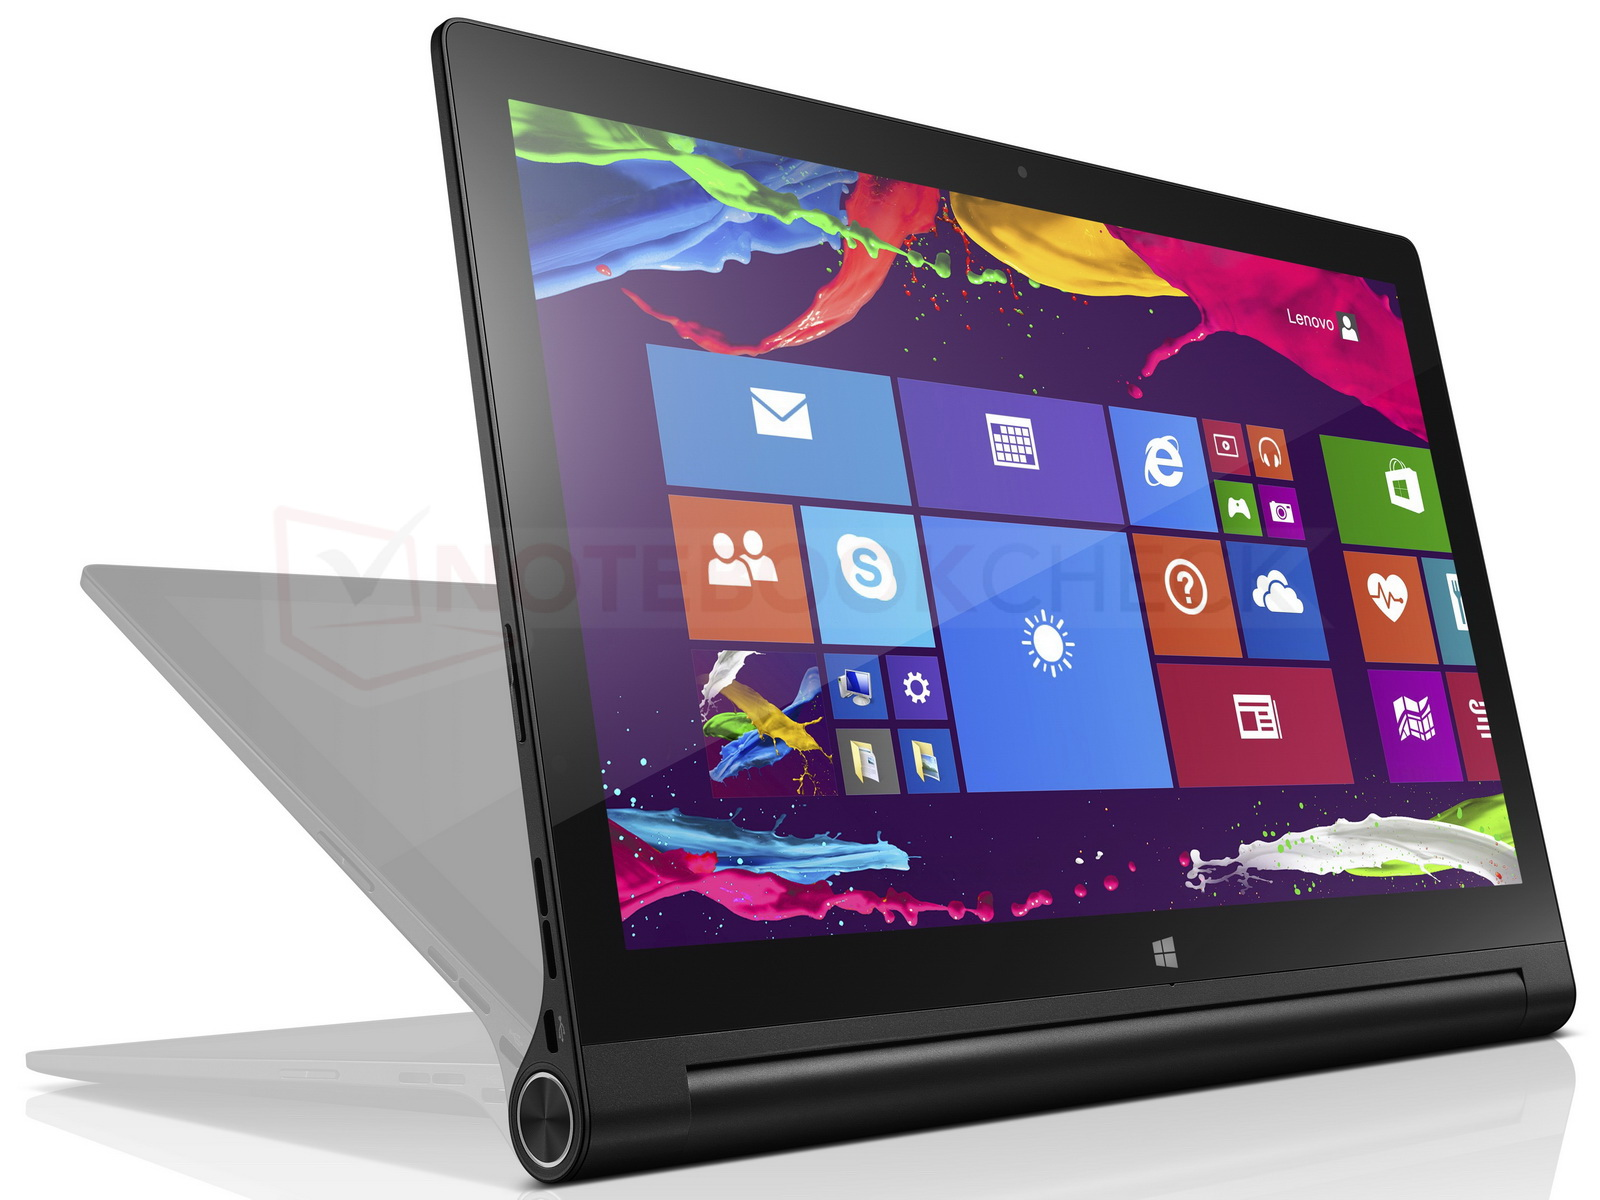 Lenovo 13 Zoll Yoga Tablet 2 mit Windows 81   Notebookcheckcom News 1600x1200